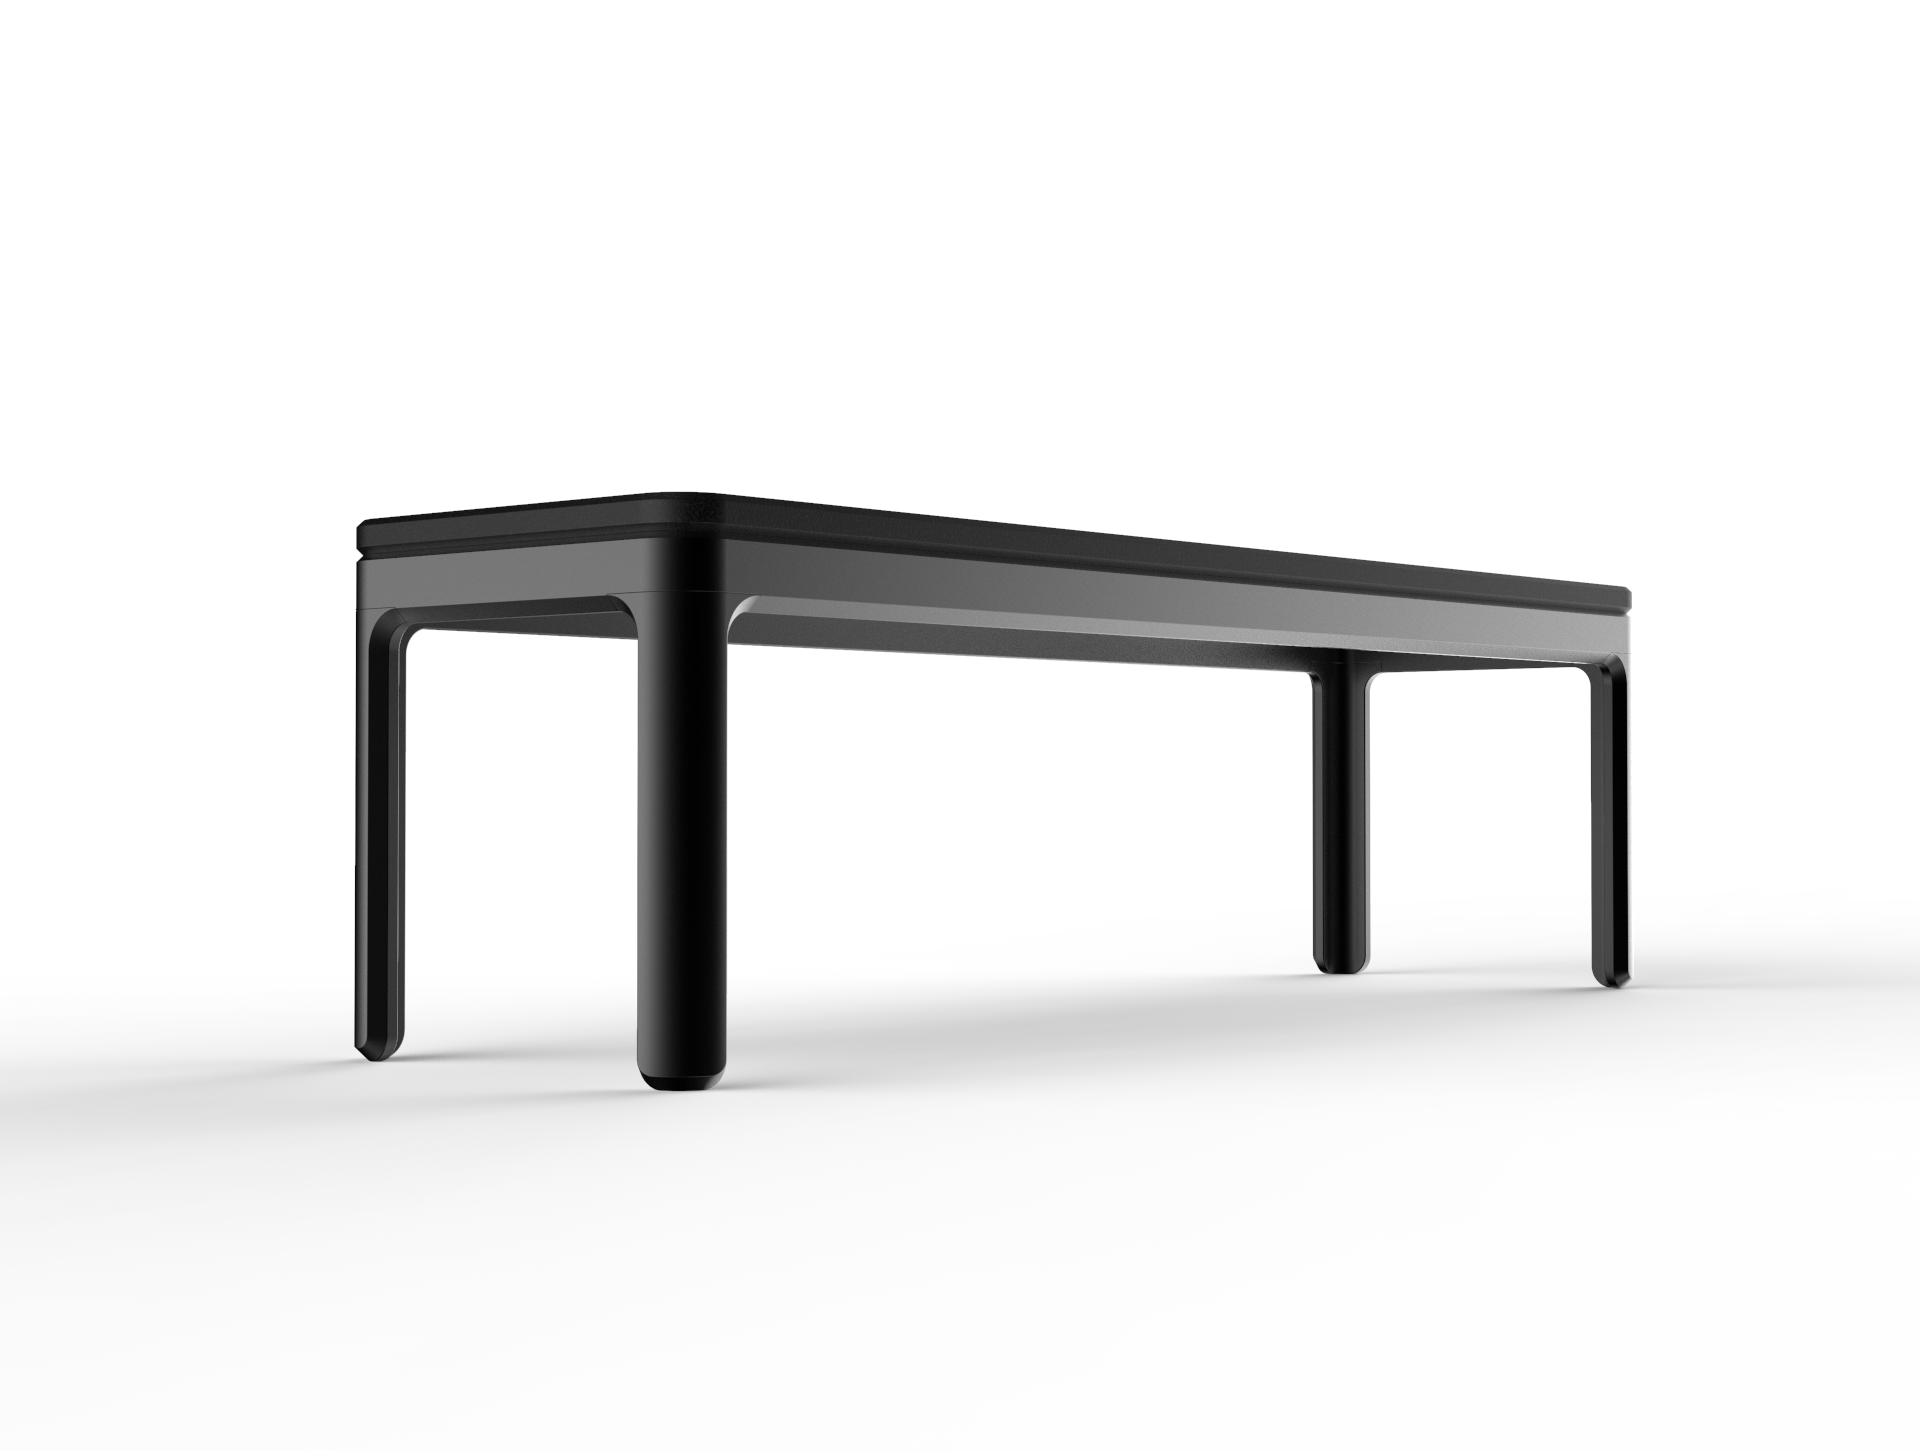 bench setup1.257.png